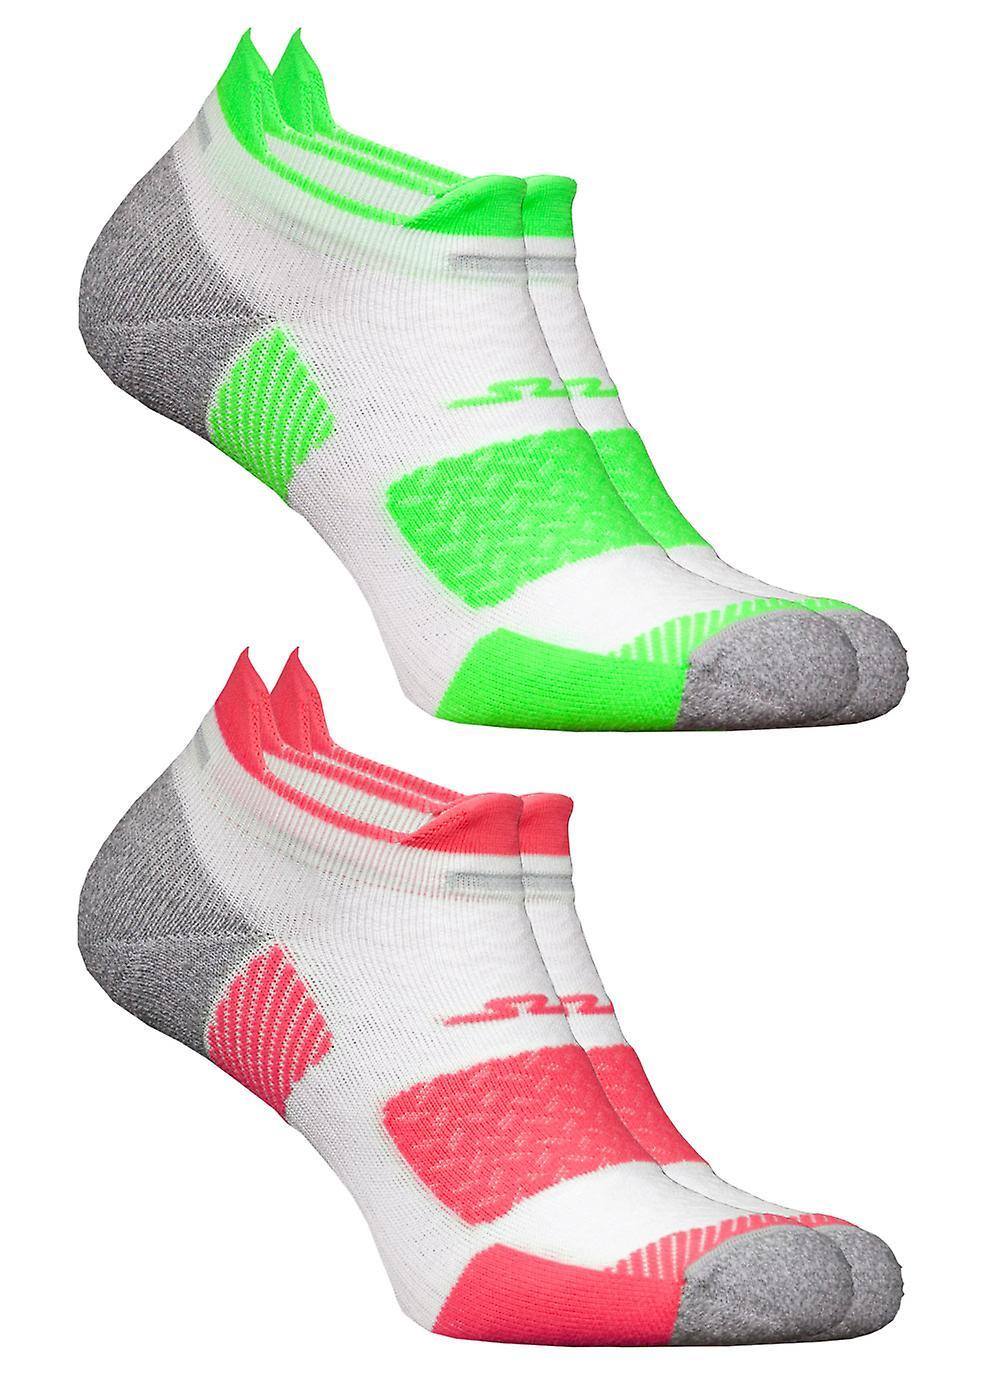 Sub Sports Elite R 360 Reflective Running Socks 2-Pack